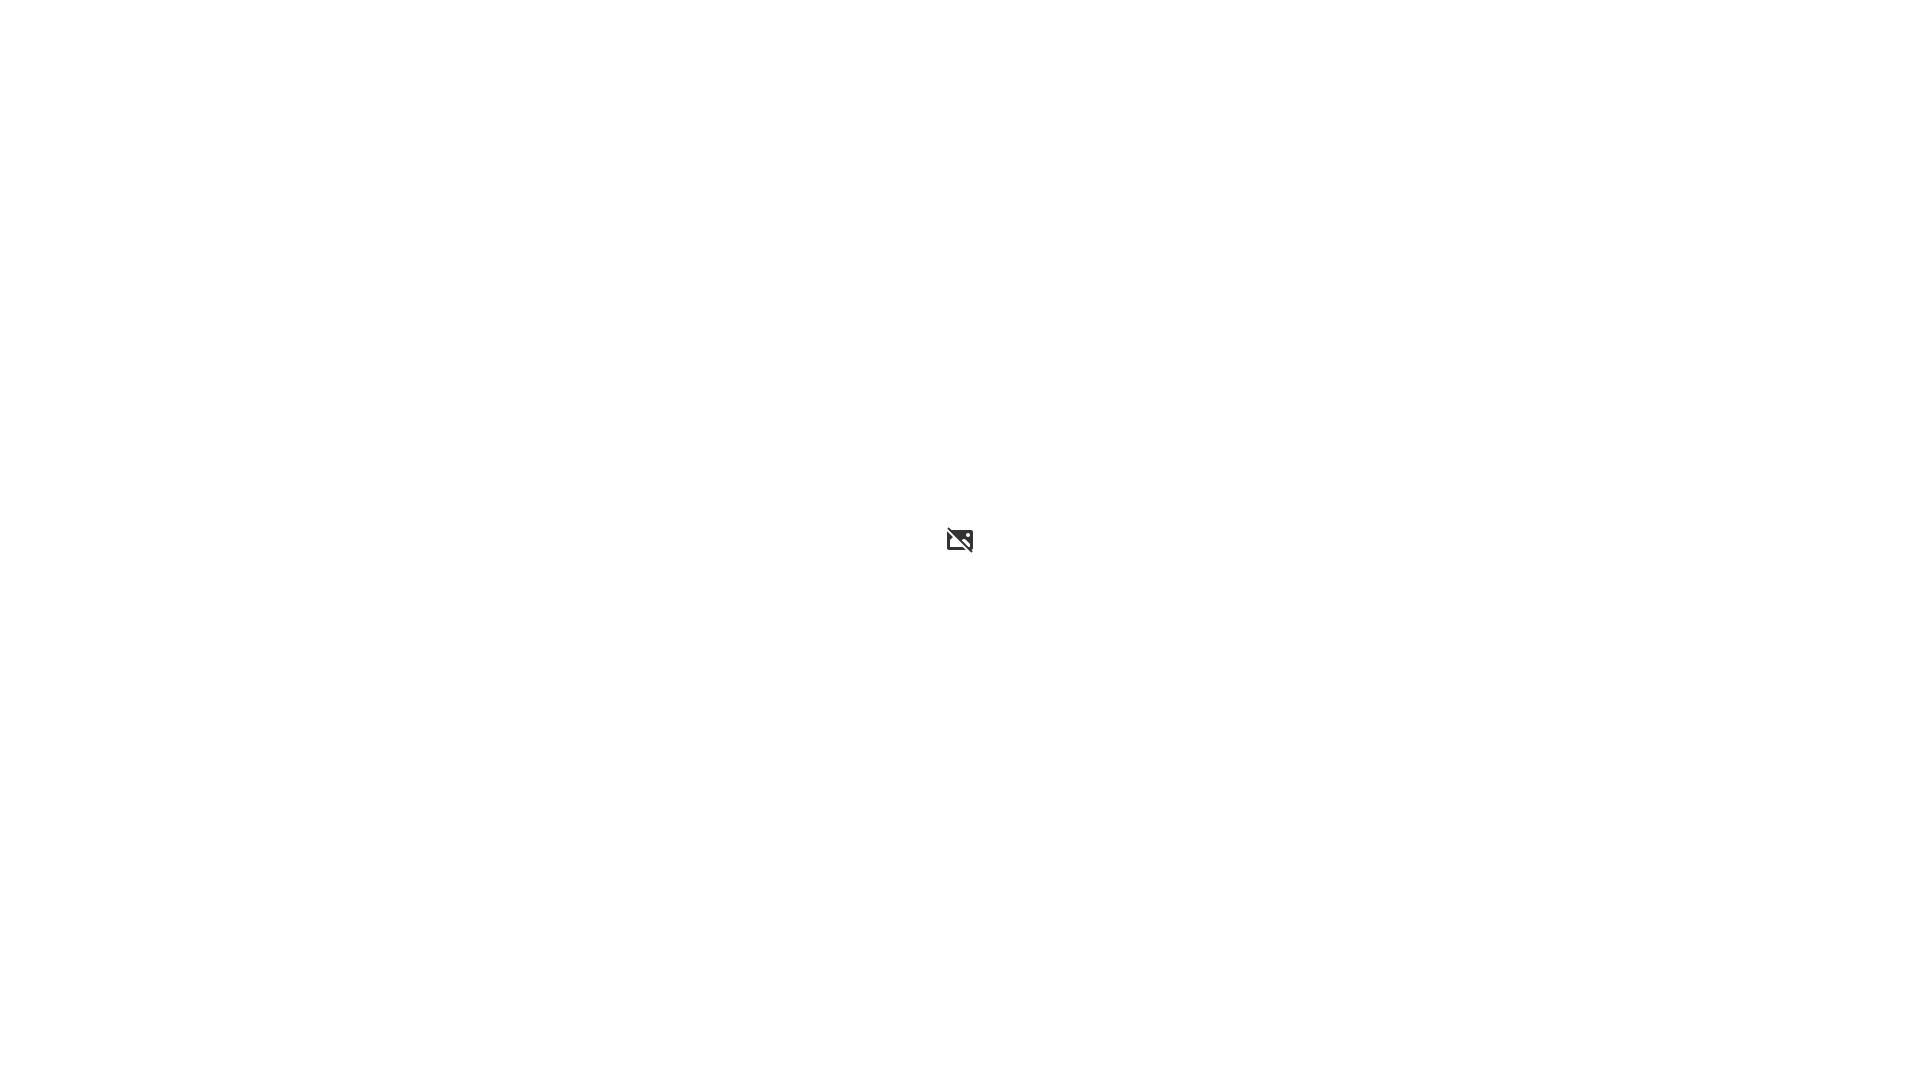 league_of_legends___heimerdinger_by_smilyfacevirus-d5vzhum